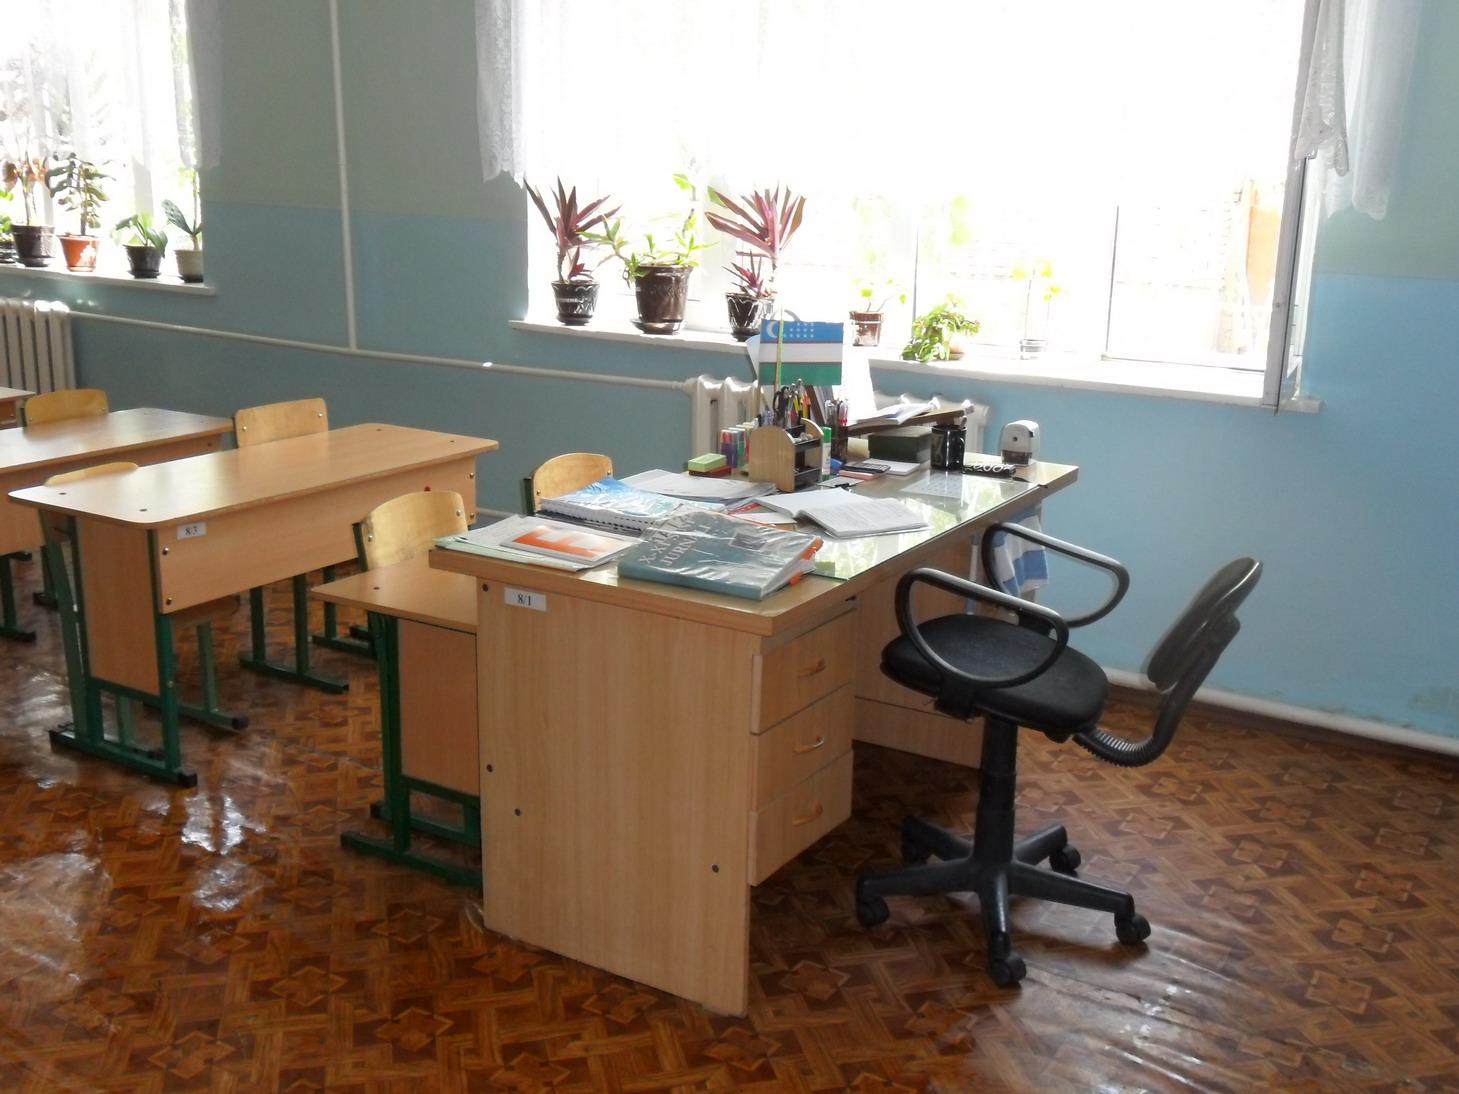 Classroom with indoor plants